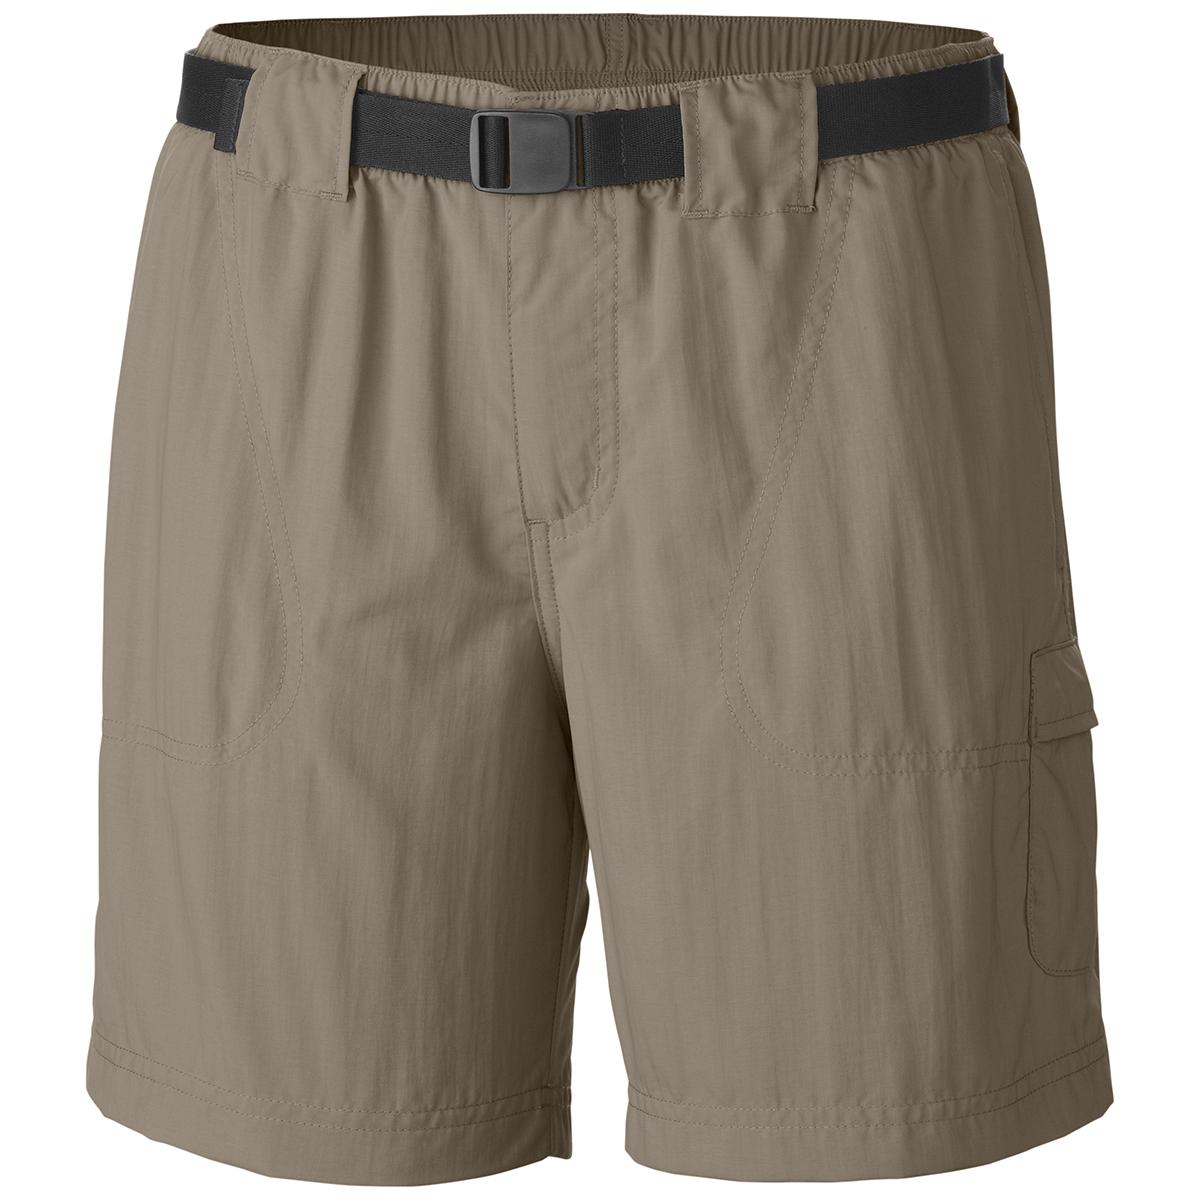 Columbia Women's Sandy River Cargo Shorts - Brown, S